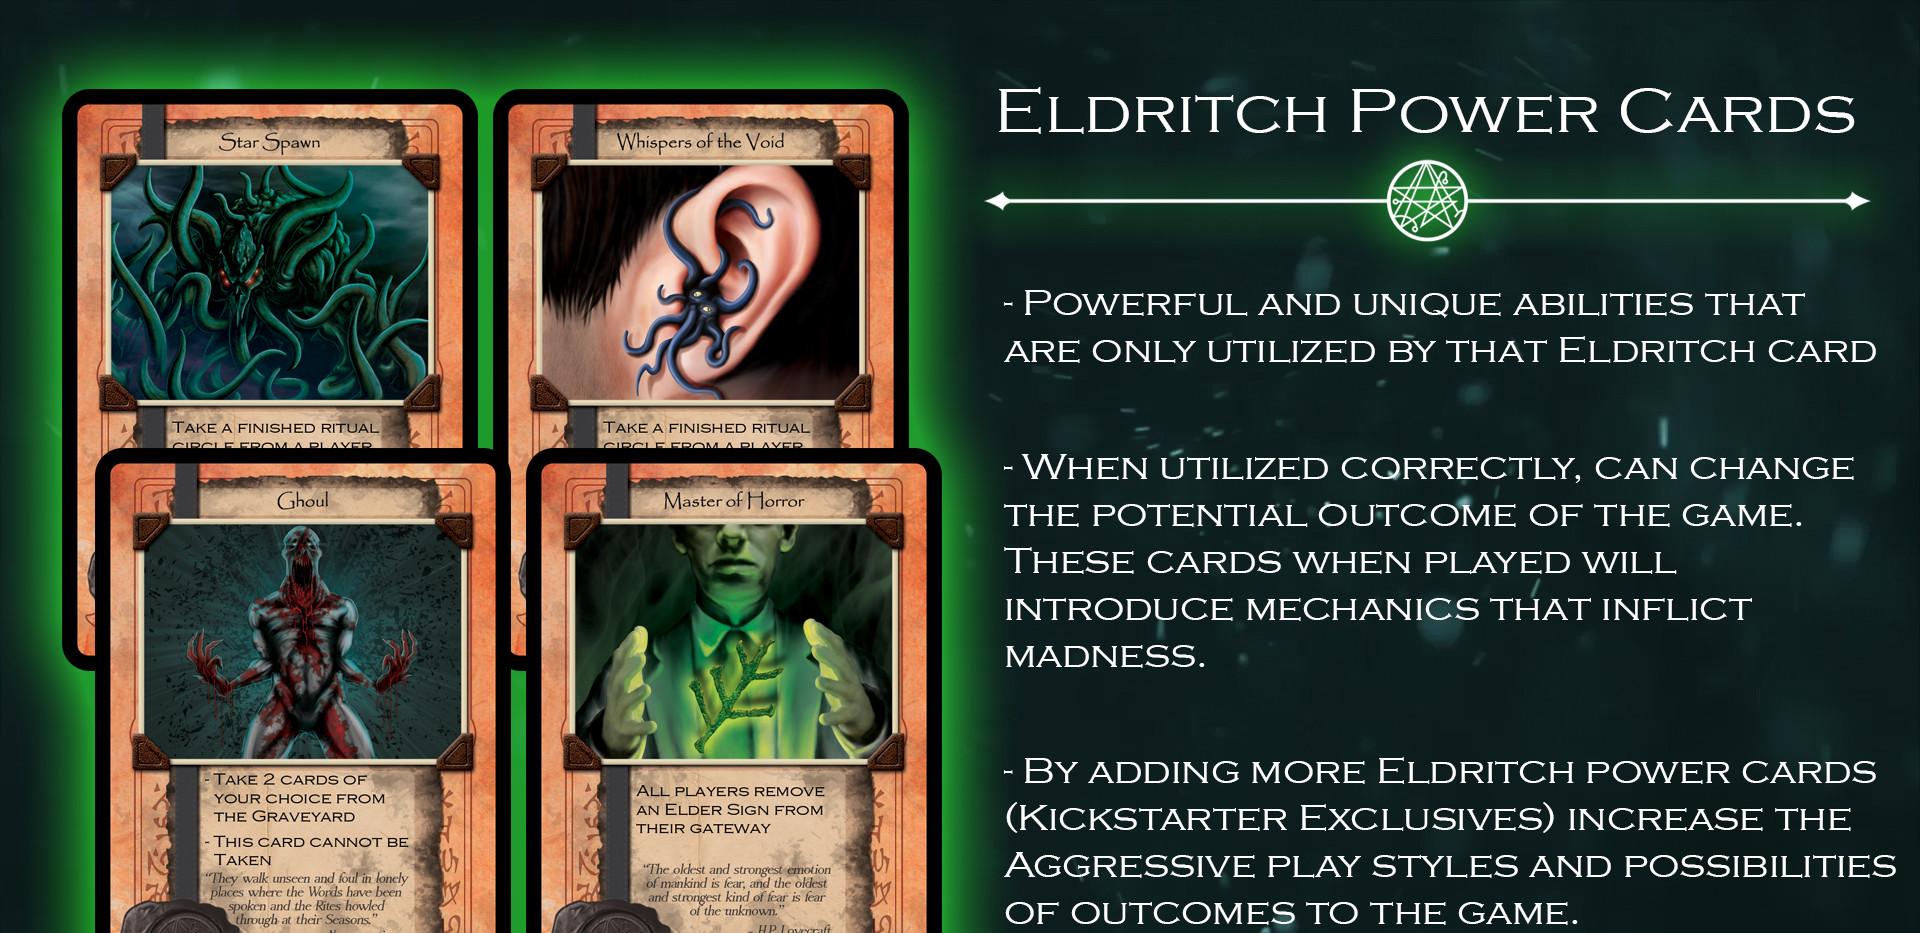 Eldritch Power Cards